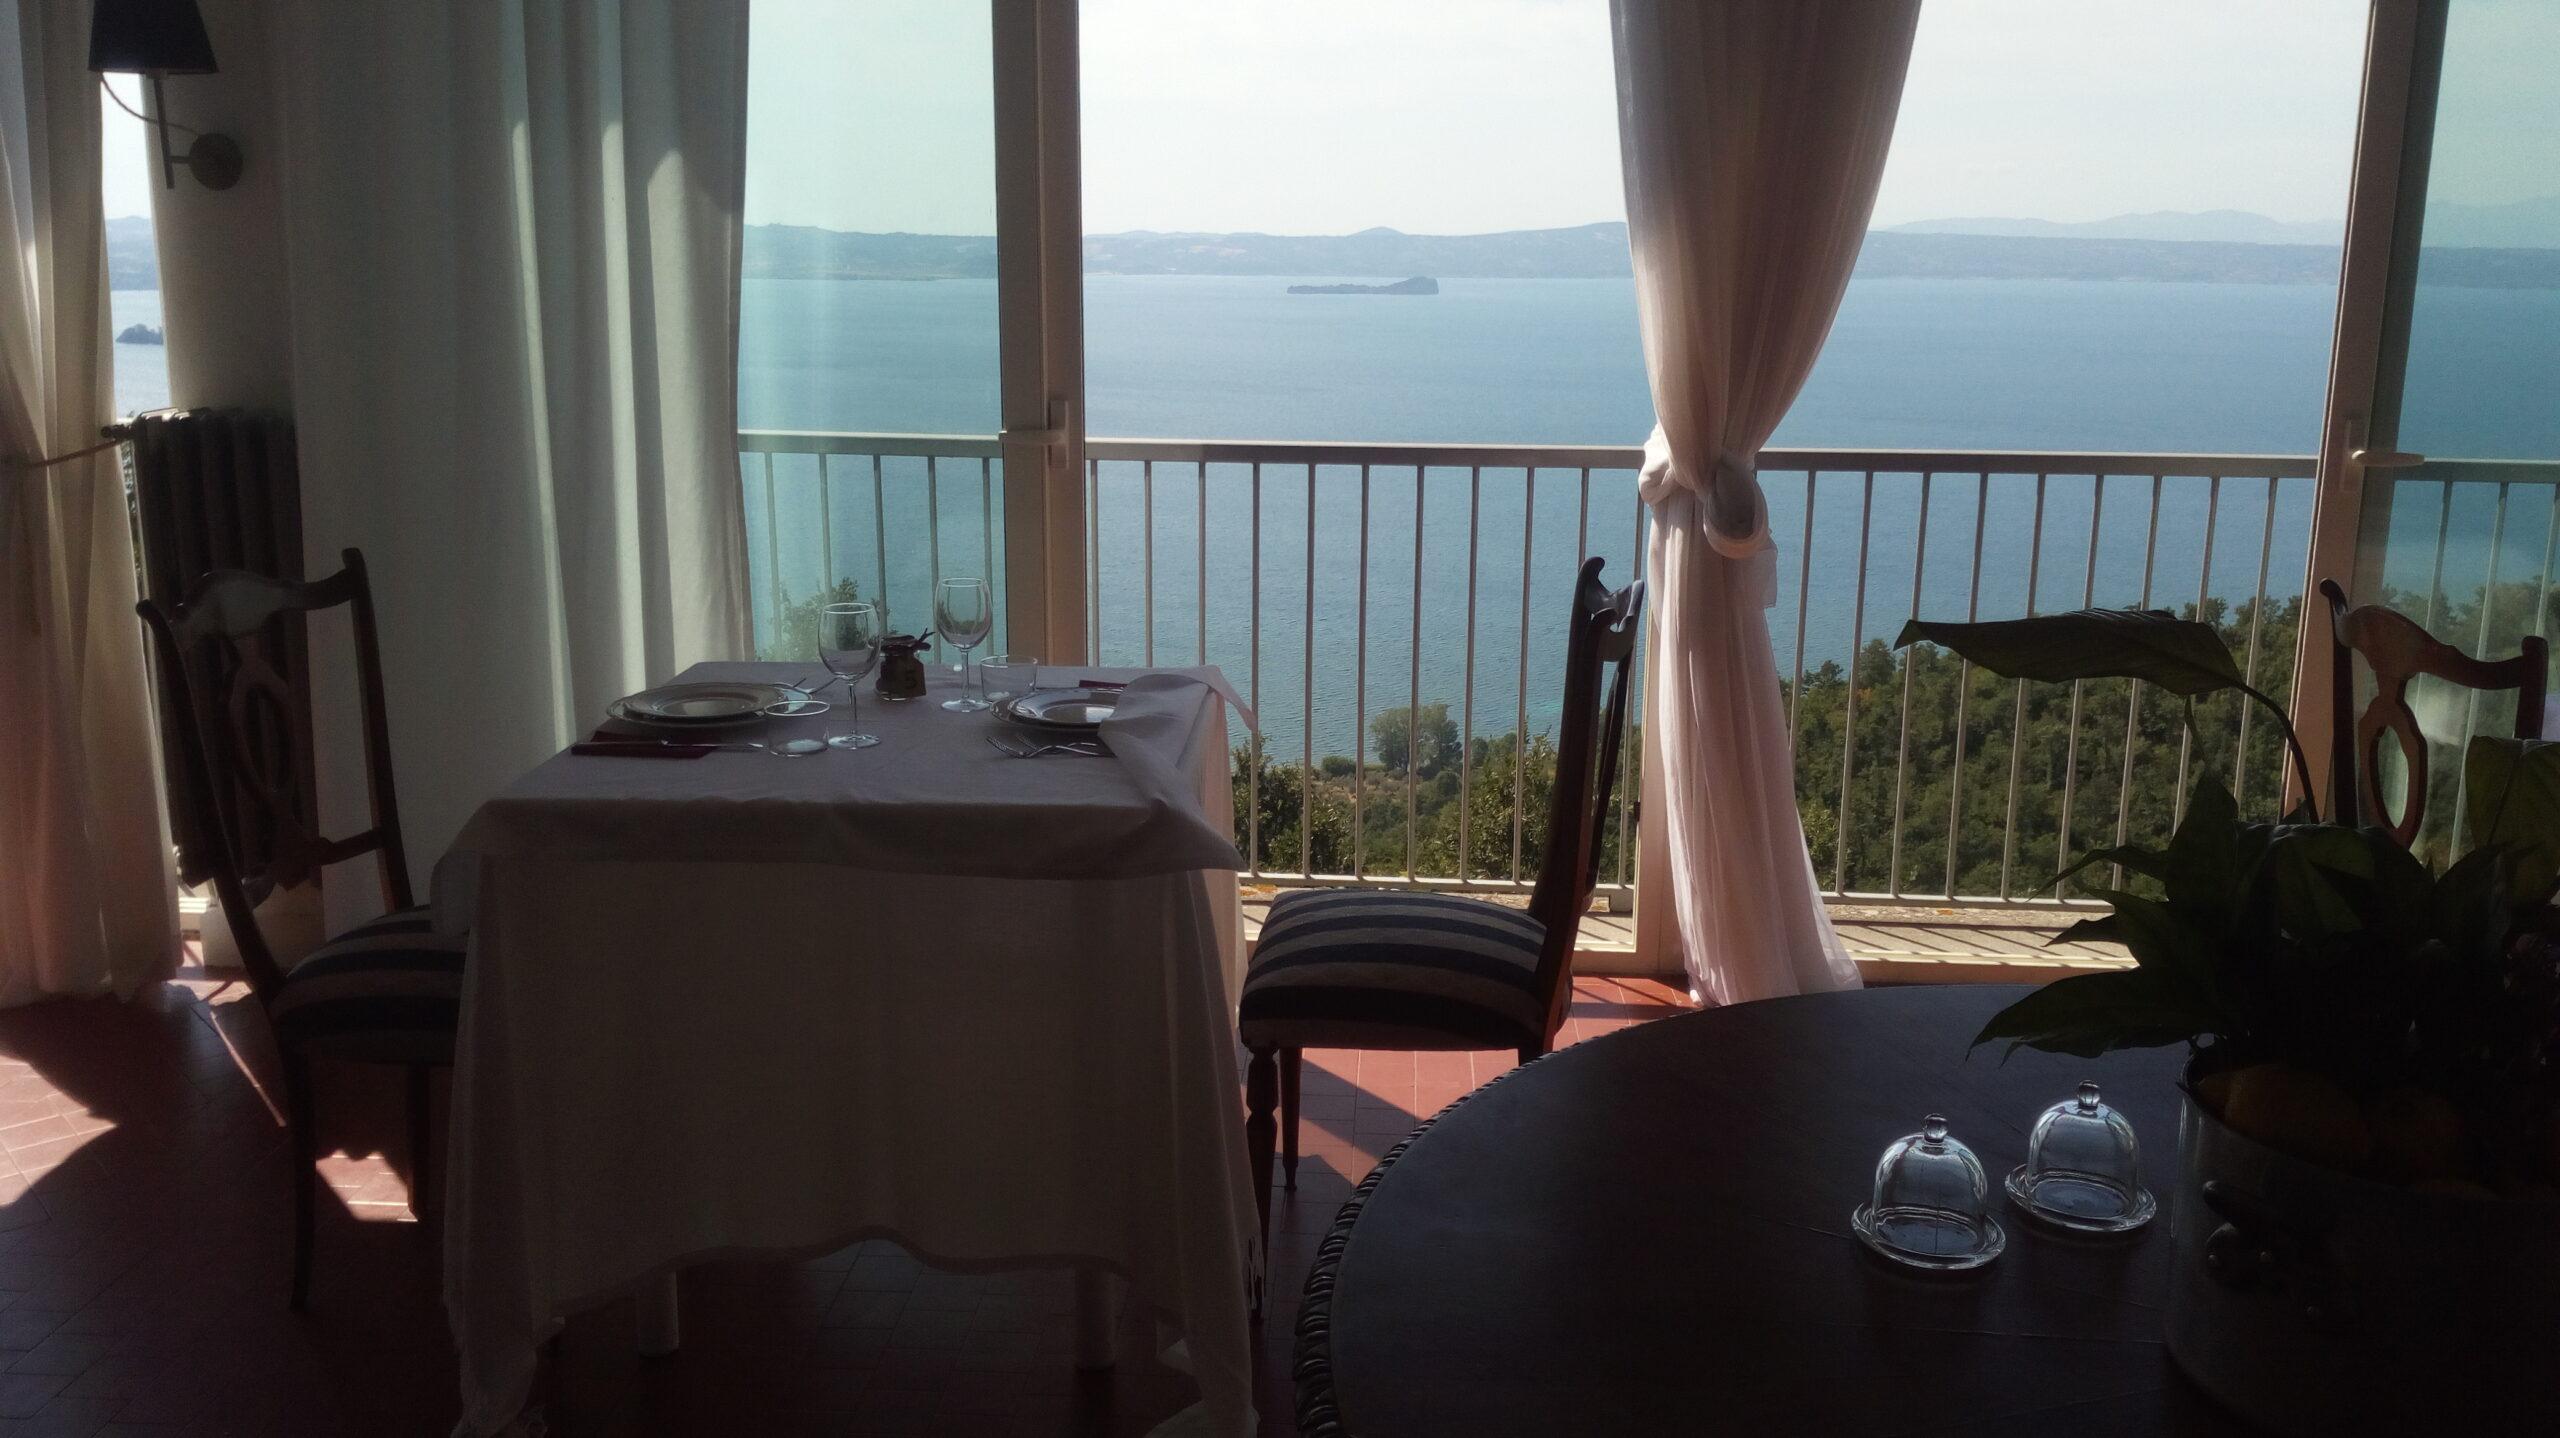 Lac de Bolsena - Voyage romantique en Italie